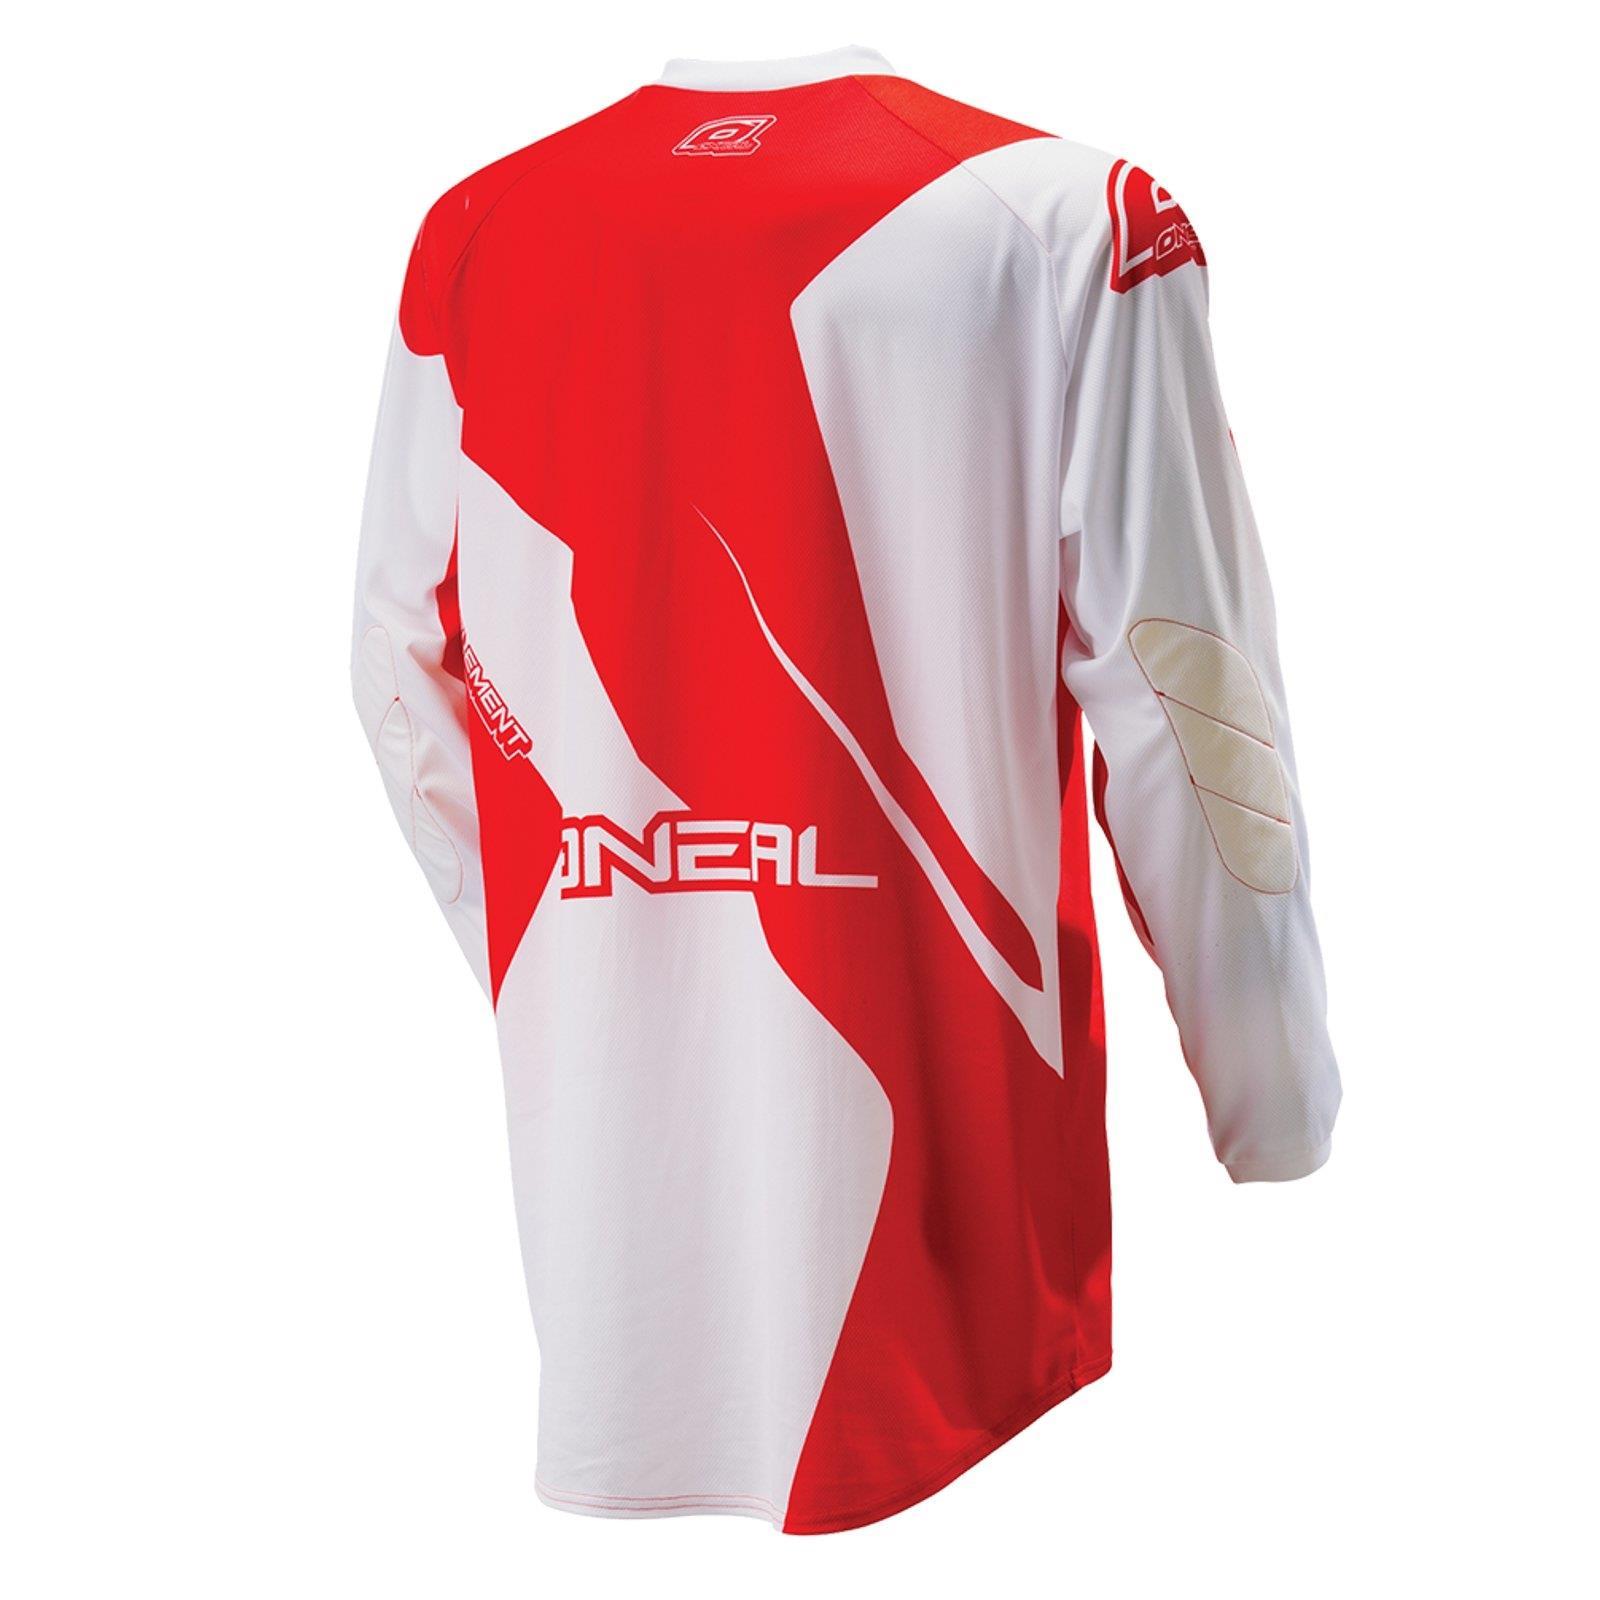 O-039-Neal-elemento-Mayhem-JERSEY-Racewear-Motocross-Maglia-MX-DH-FR-MTB-MOUNTAIN-BIKE miniatura 104